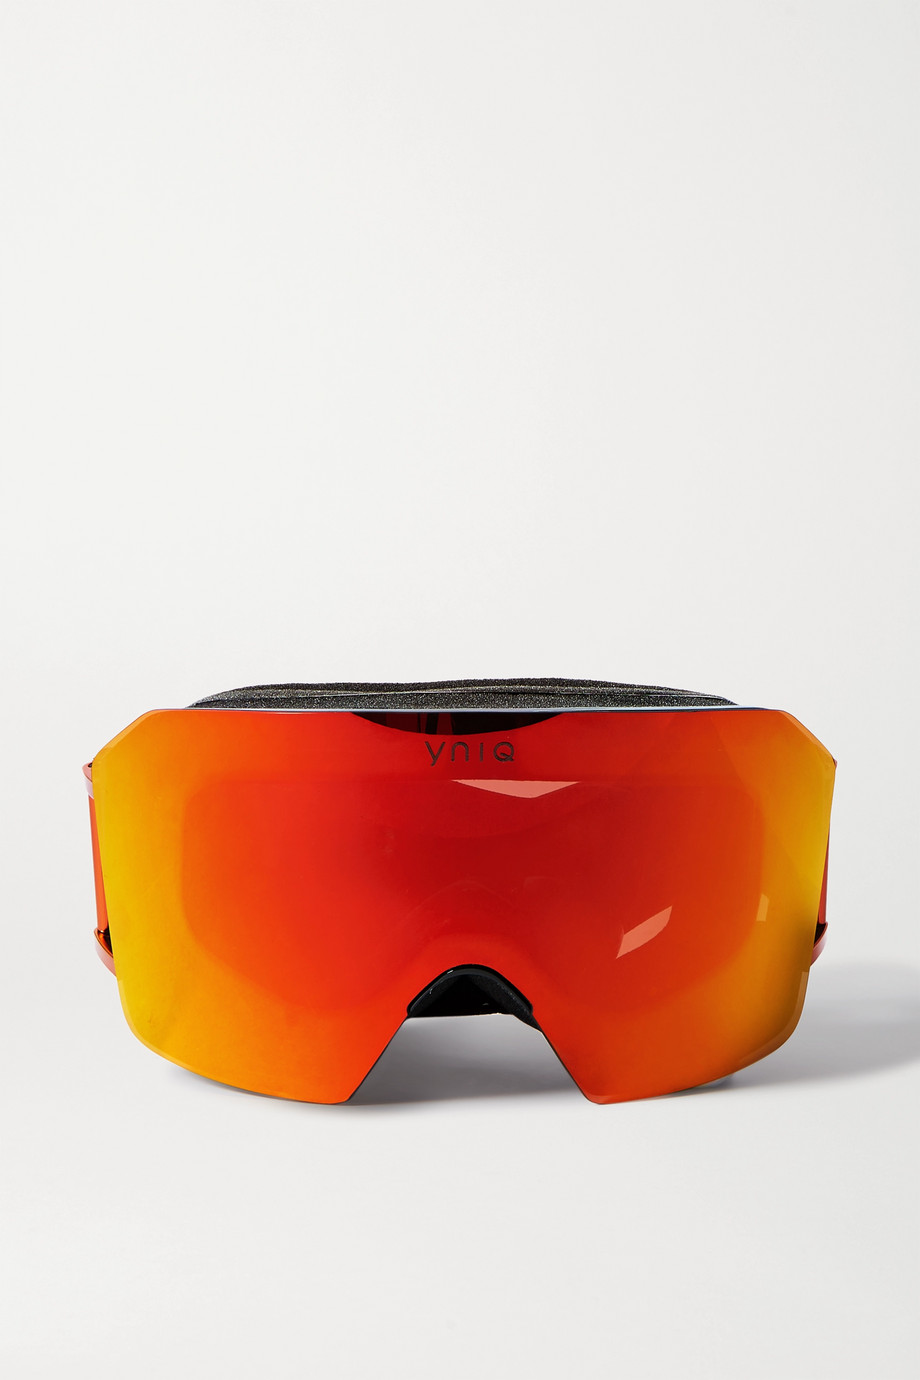 YNIQ Model Nine mirrored ski goggles